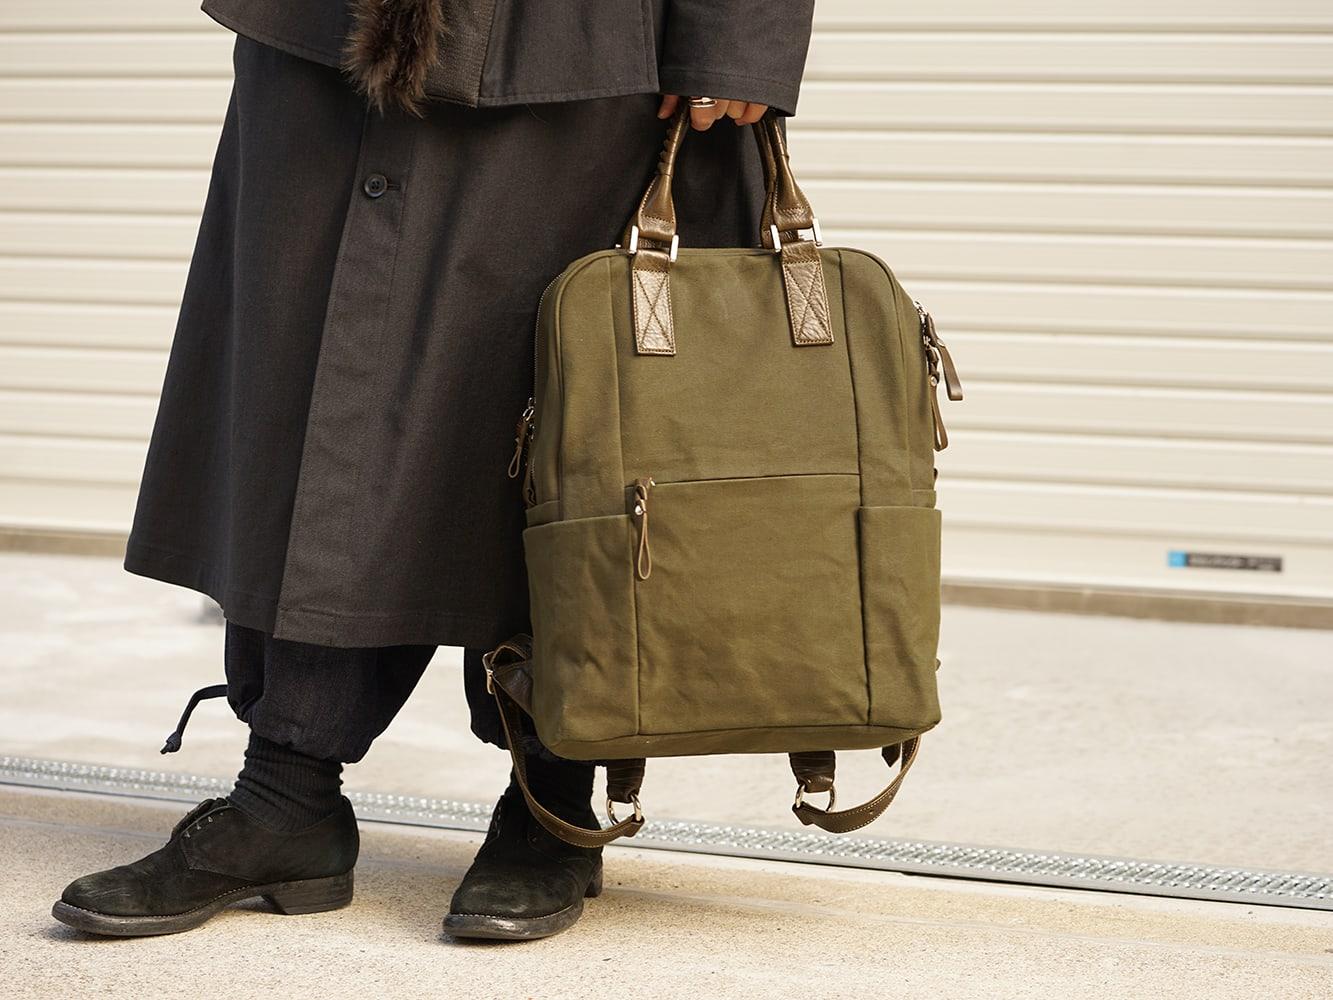 Yohji Yamamoto High-necked leather jacket Style 07